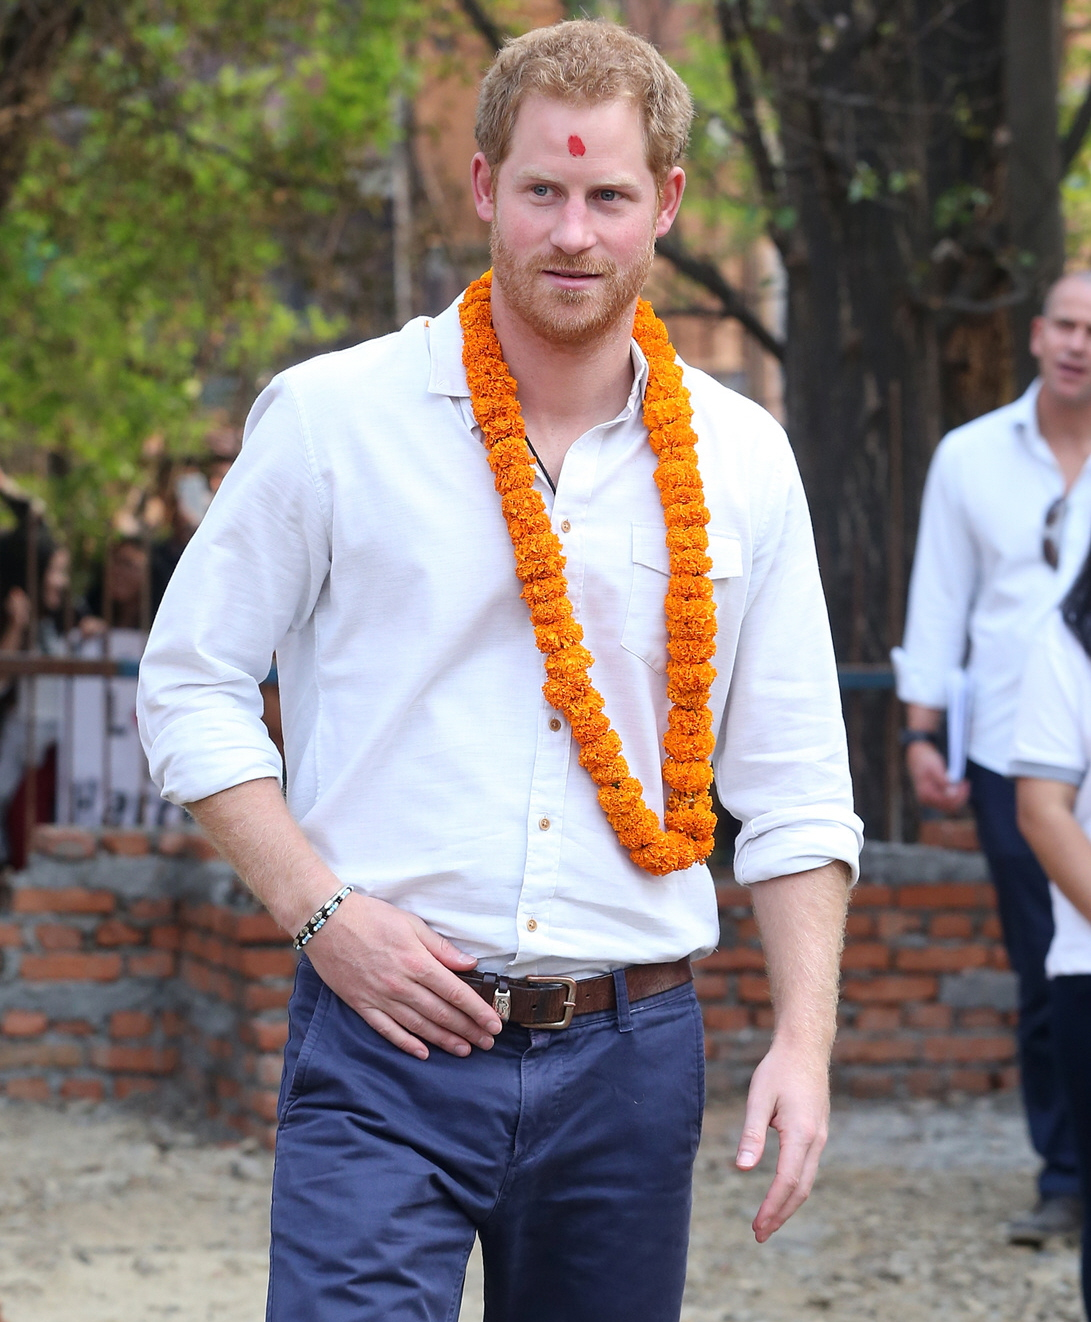 Celebrity News 24/7: Prince Harry's Nepal Trip Involved